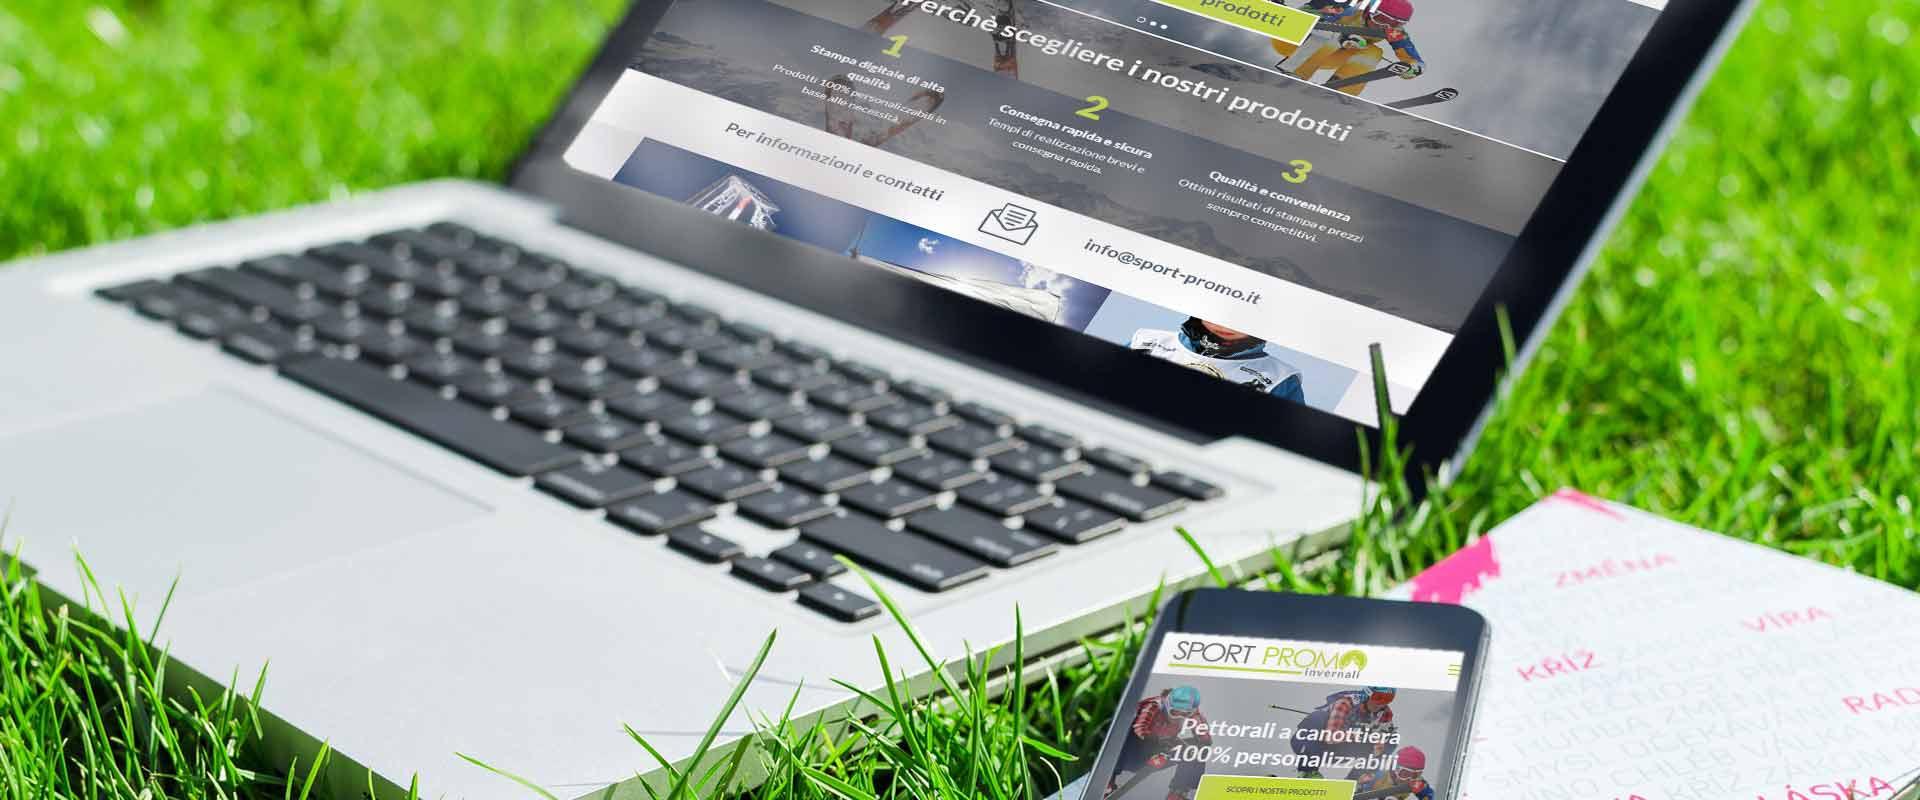 softplaceweb - sport promo